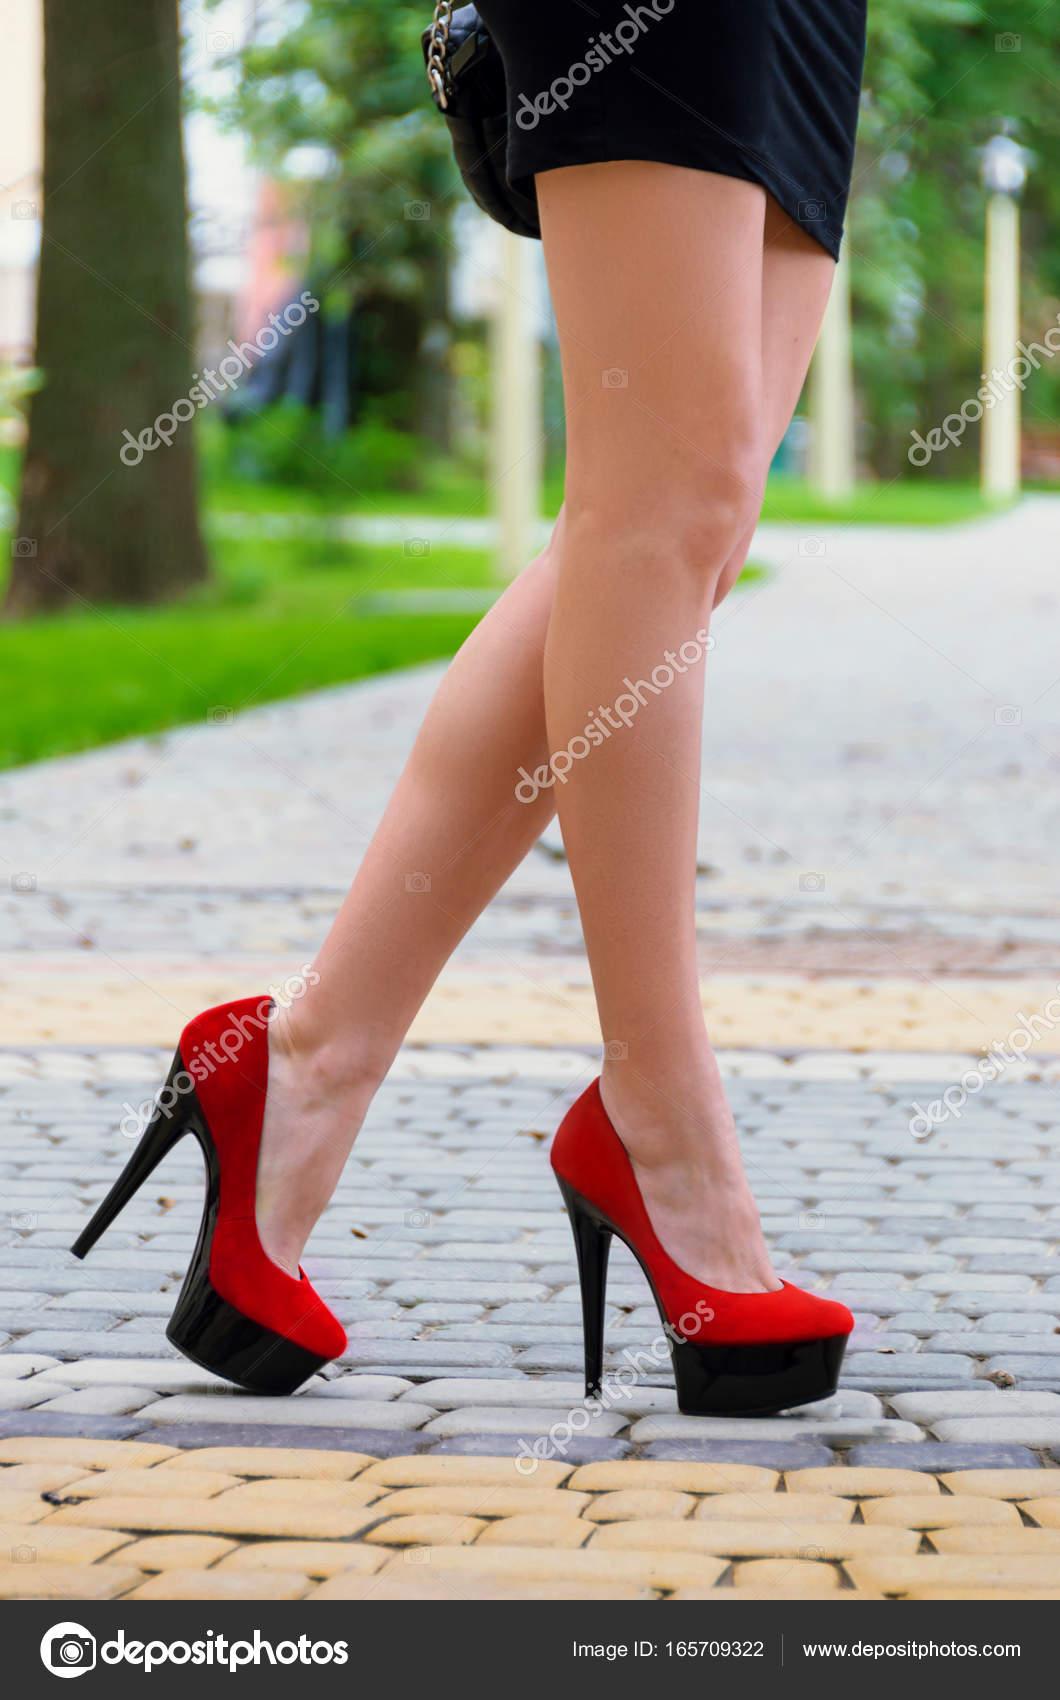 Piedini Rosse A Sono Lunghi Snelli Calzati In Femminili Tacco Scarpe 4q4wCRg